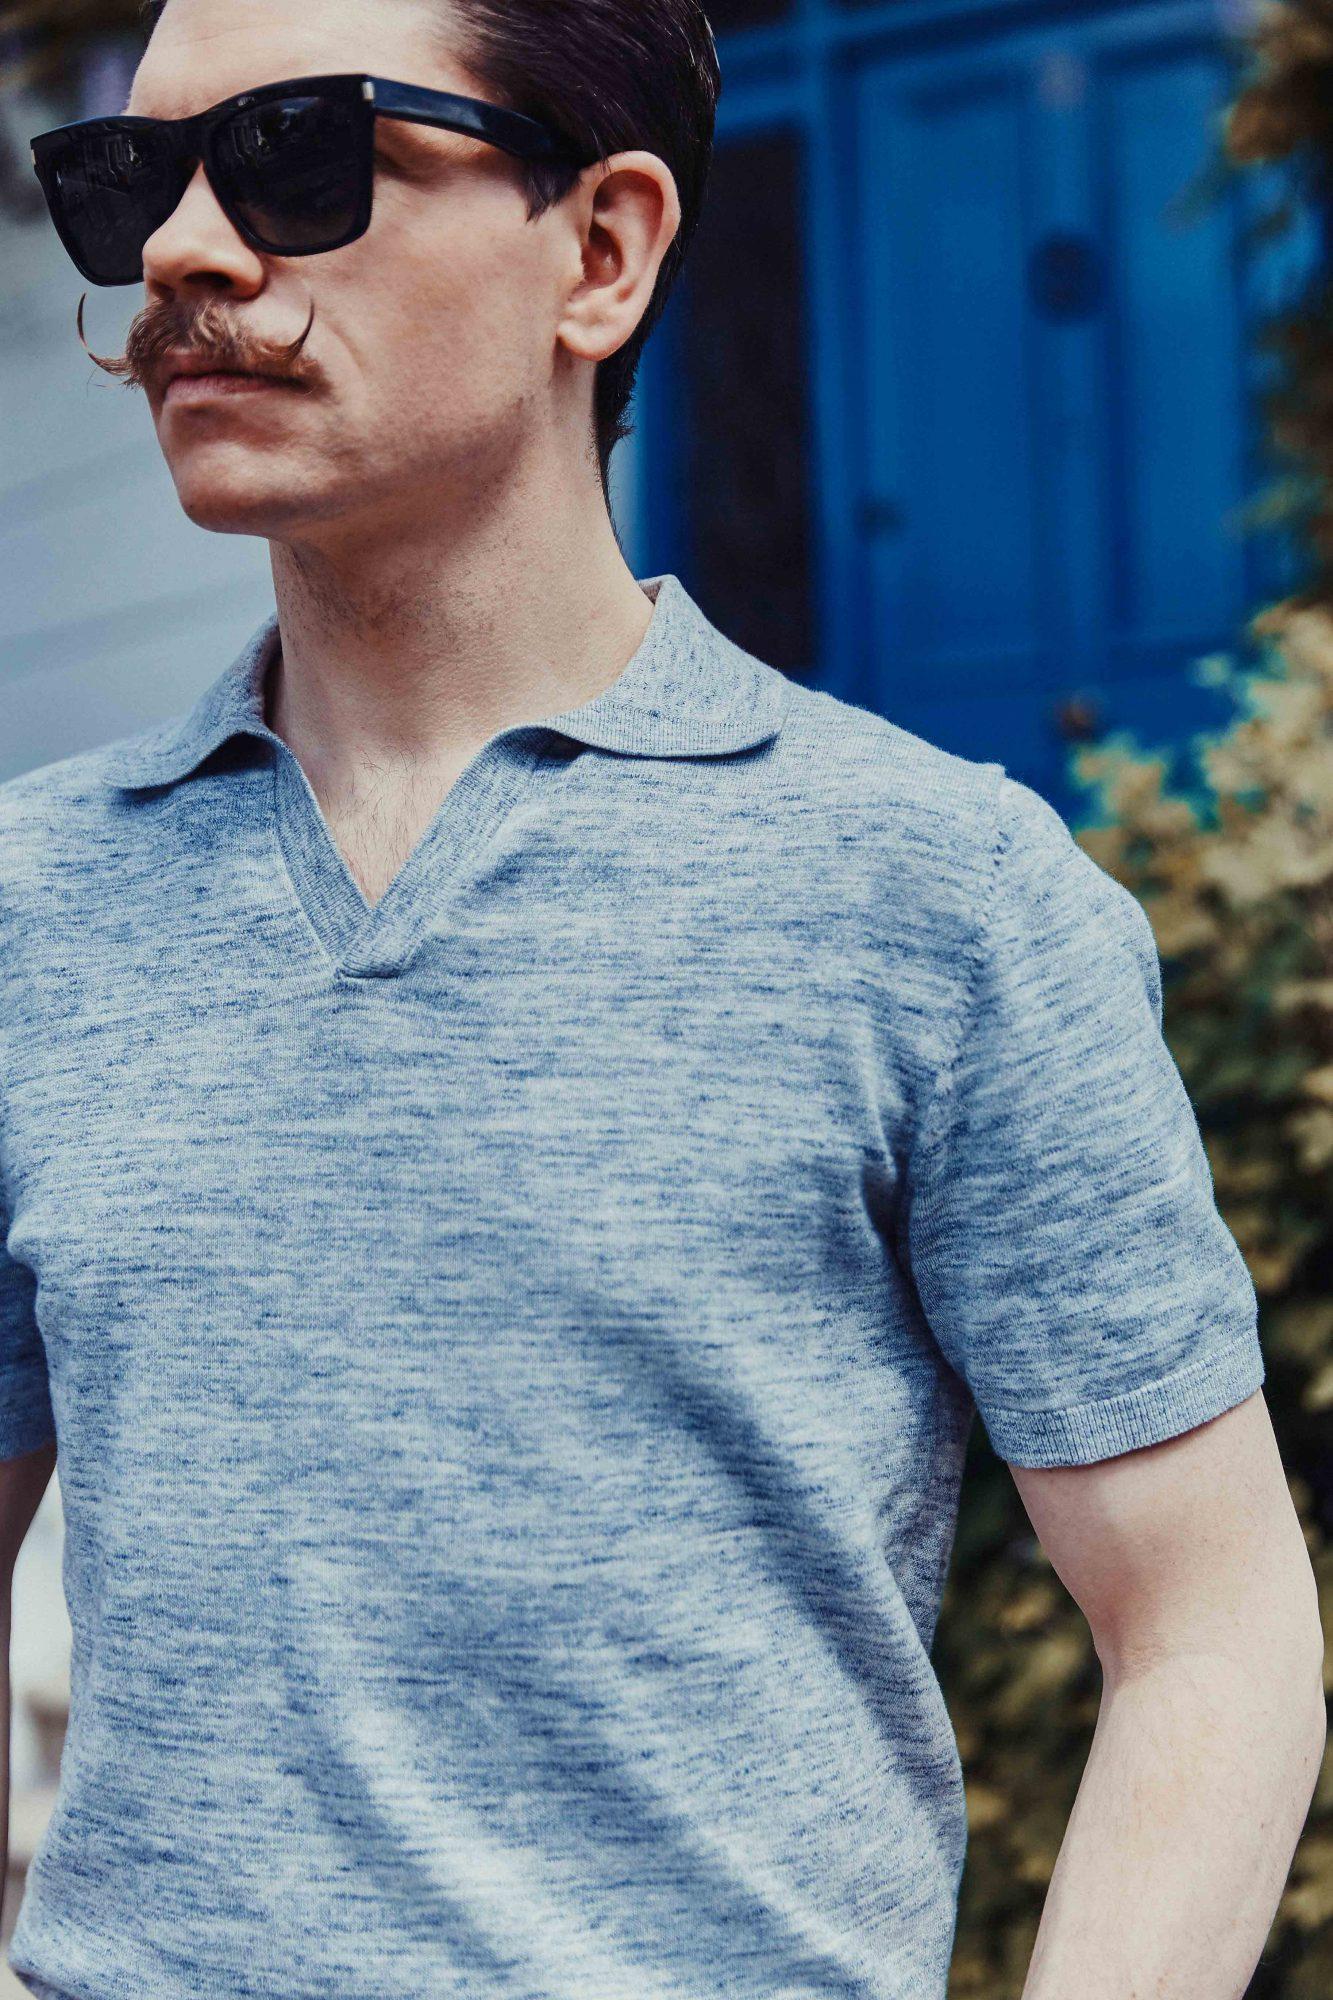 mens-t-shirt-alternatives-menswear-robin-james-man-for-himself-3